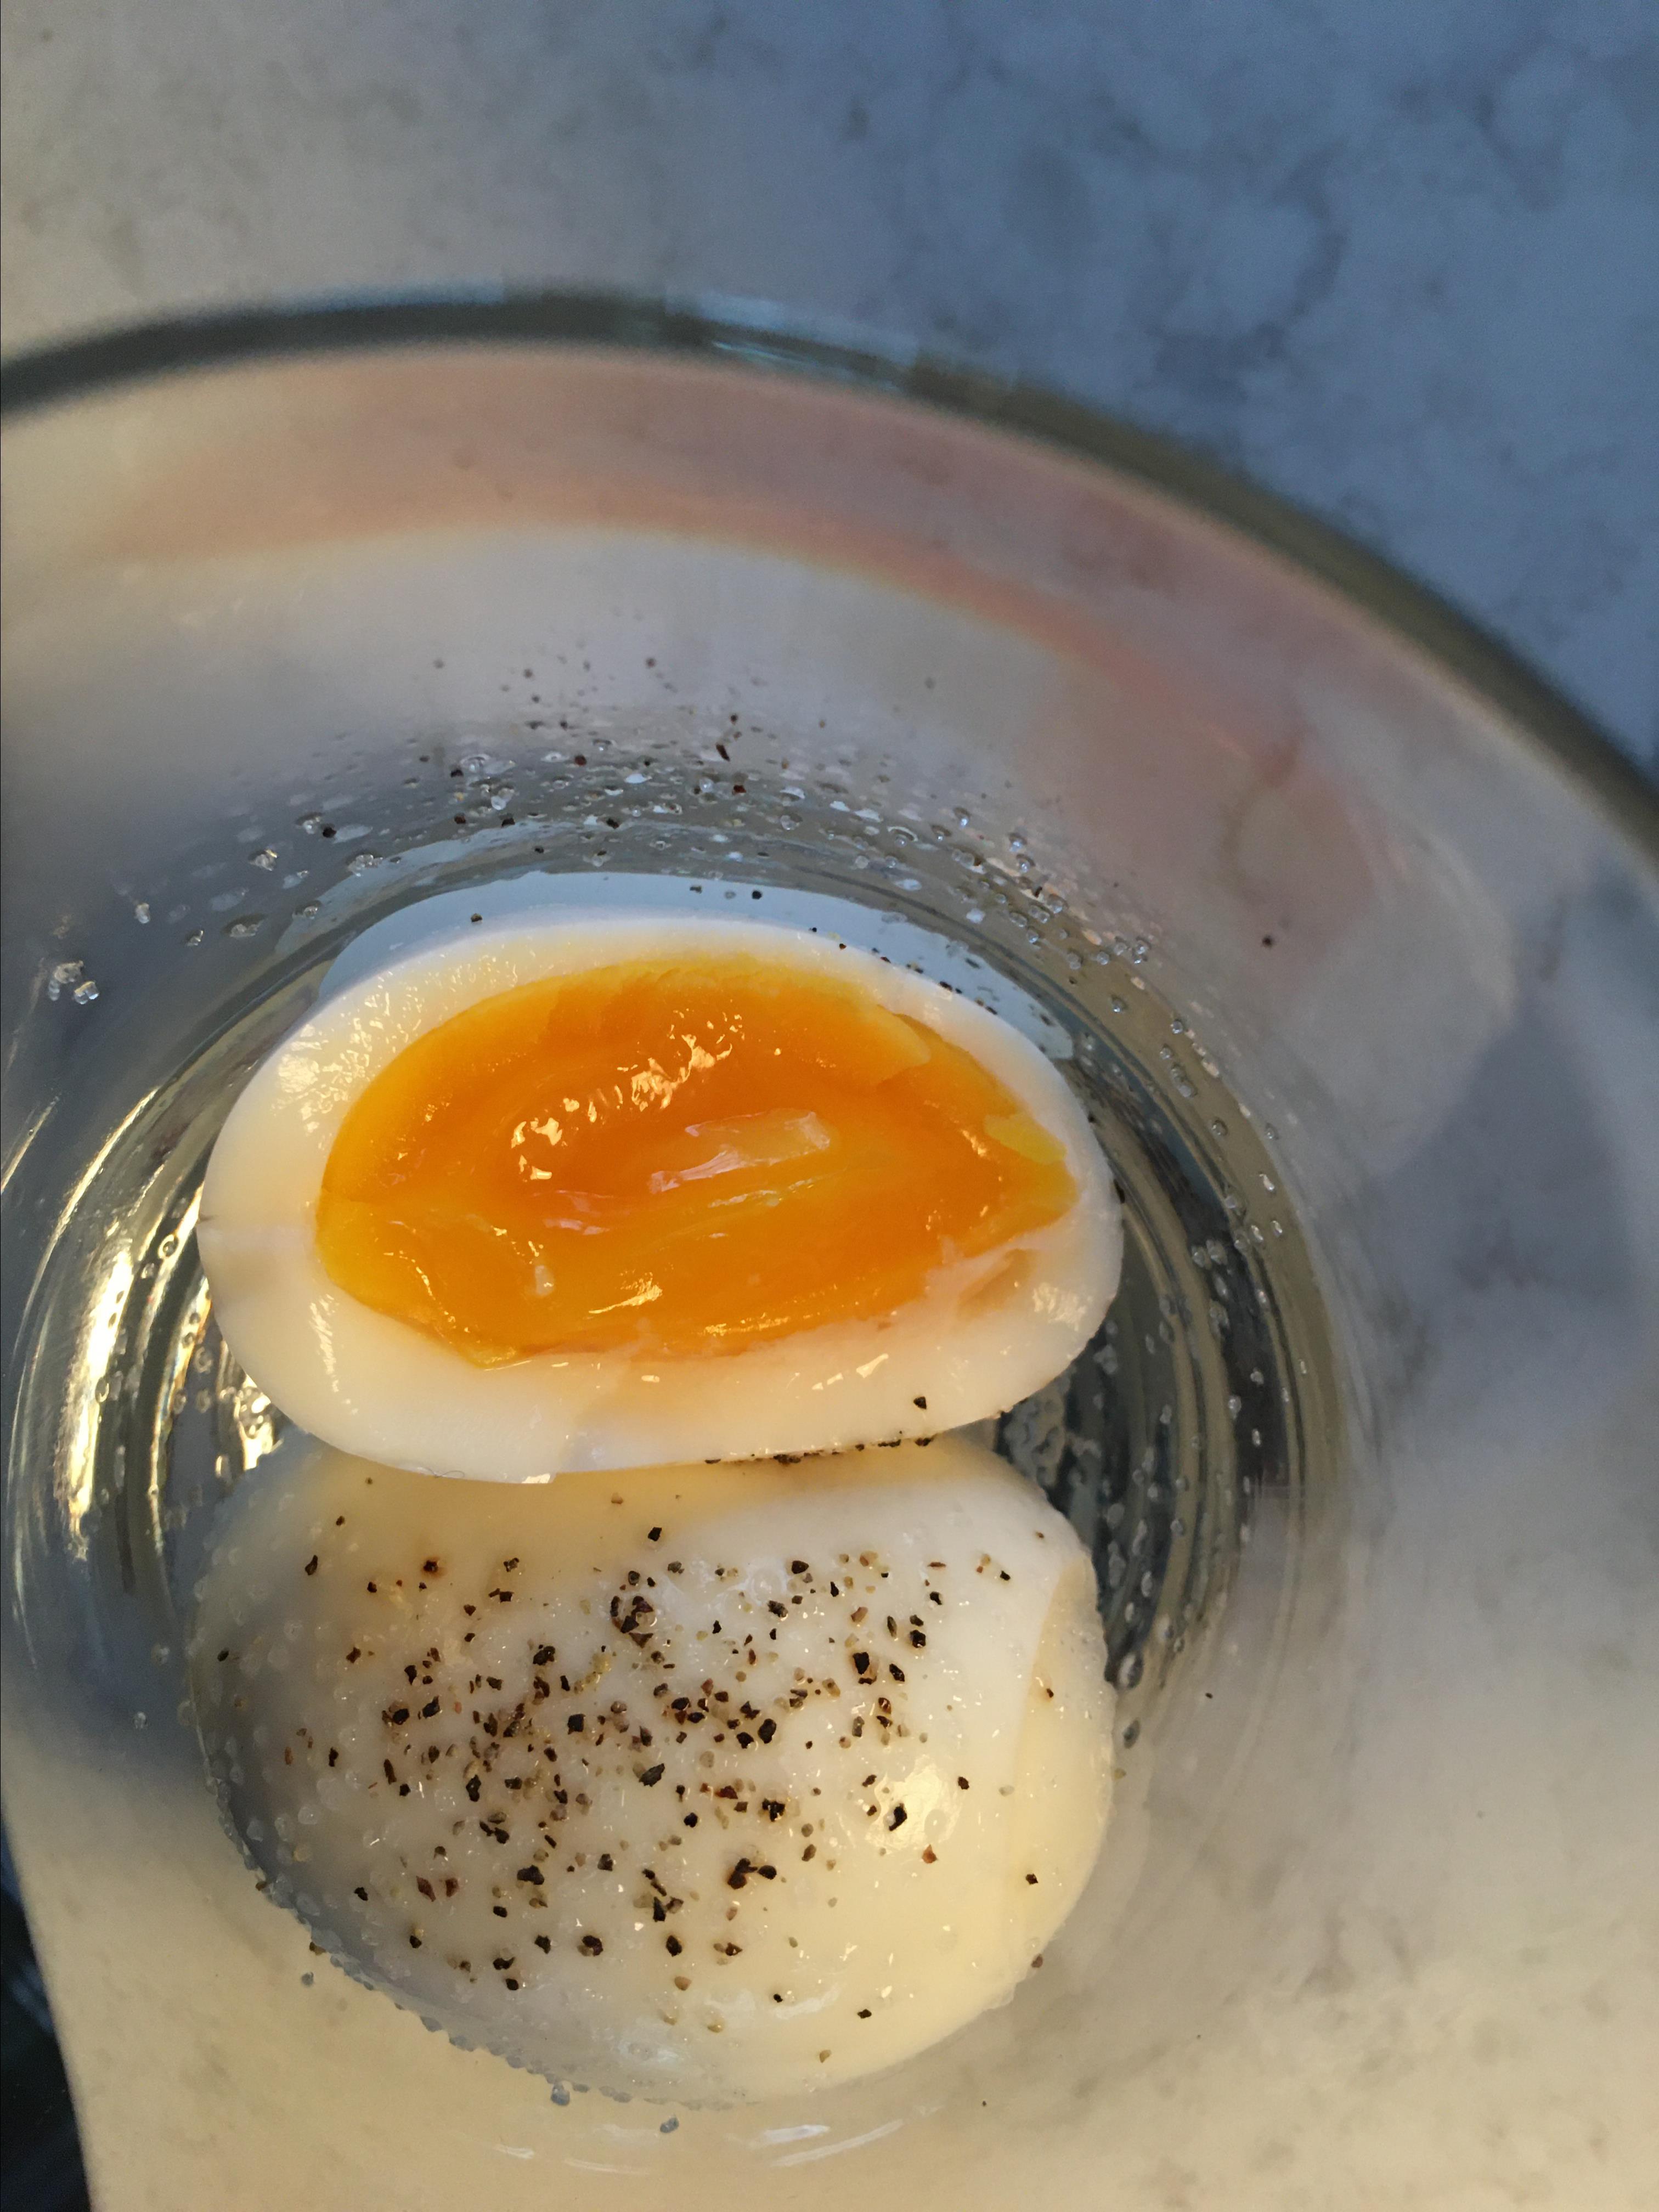 Sherry's Perfect Sous Vide Eggs Paul Bialik